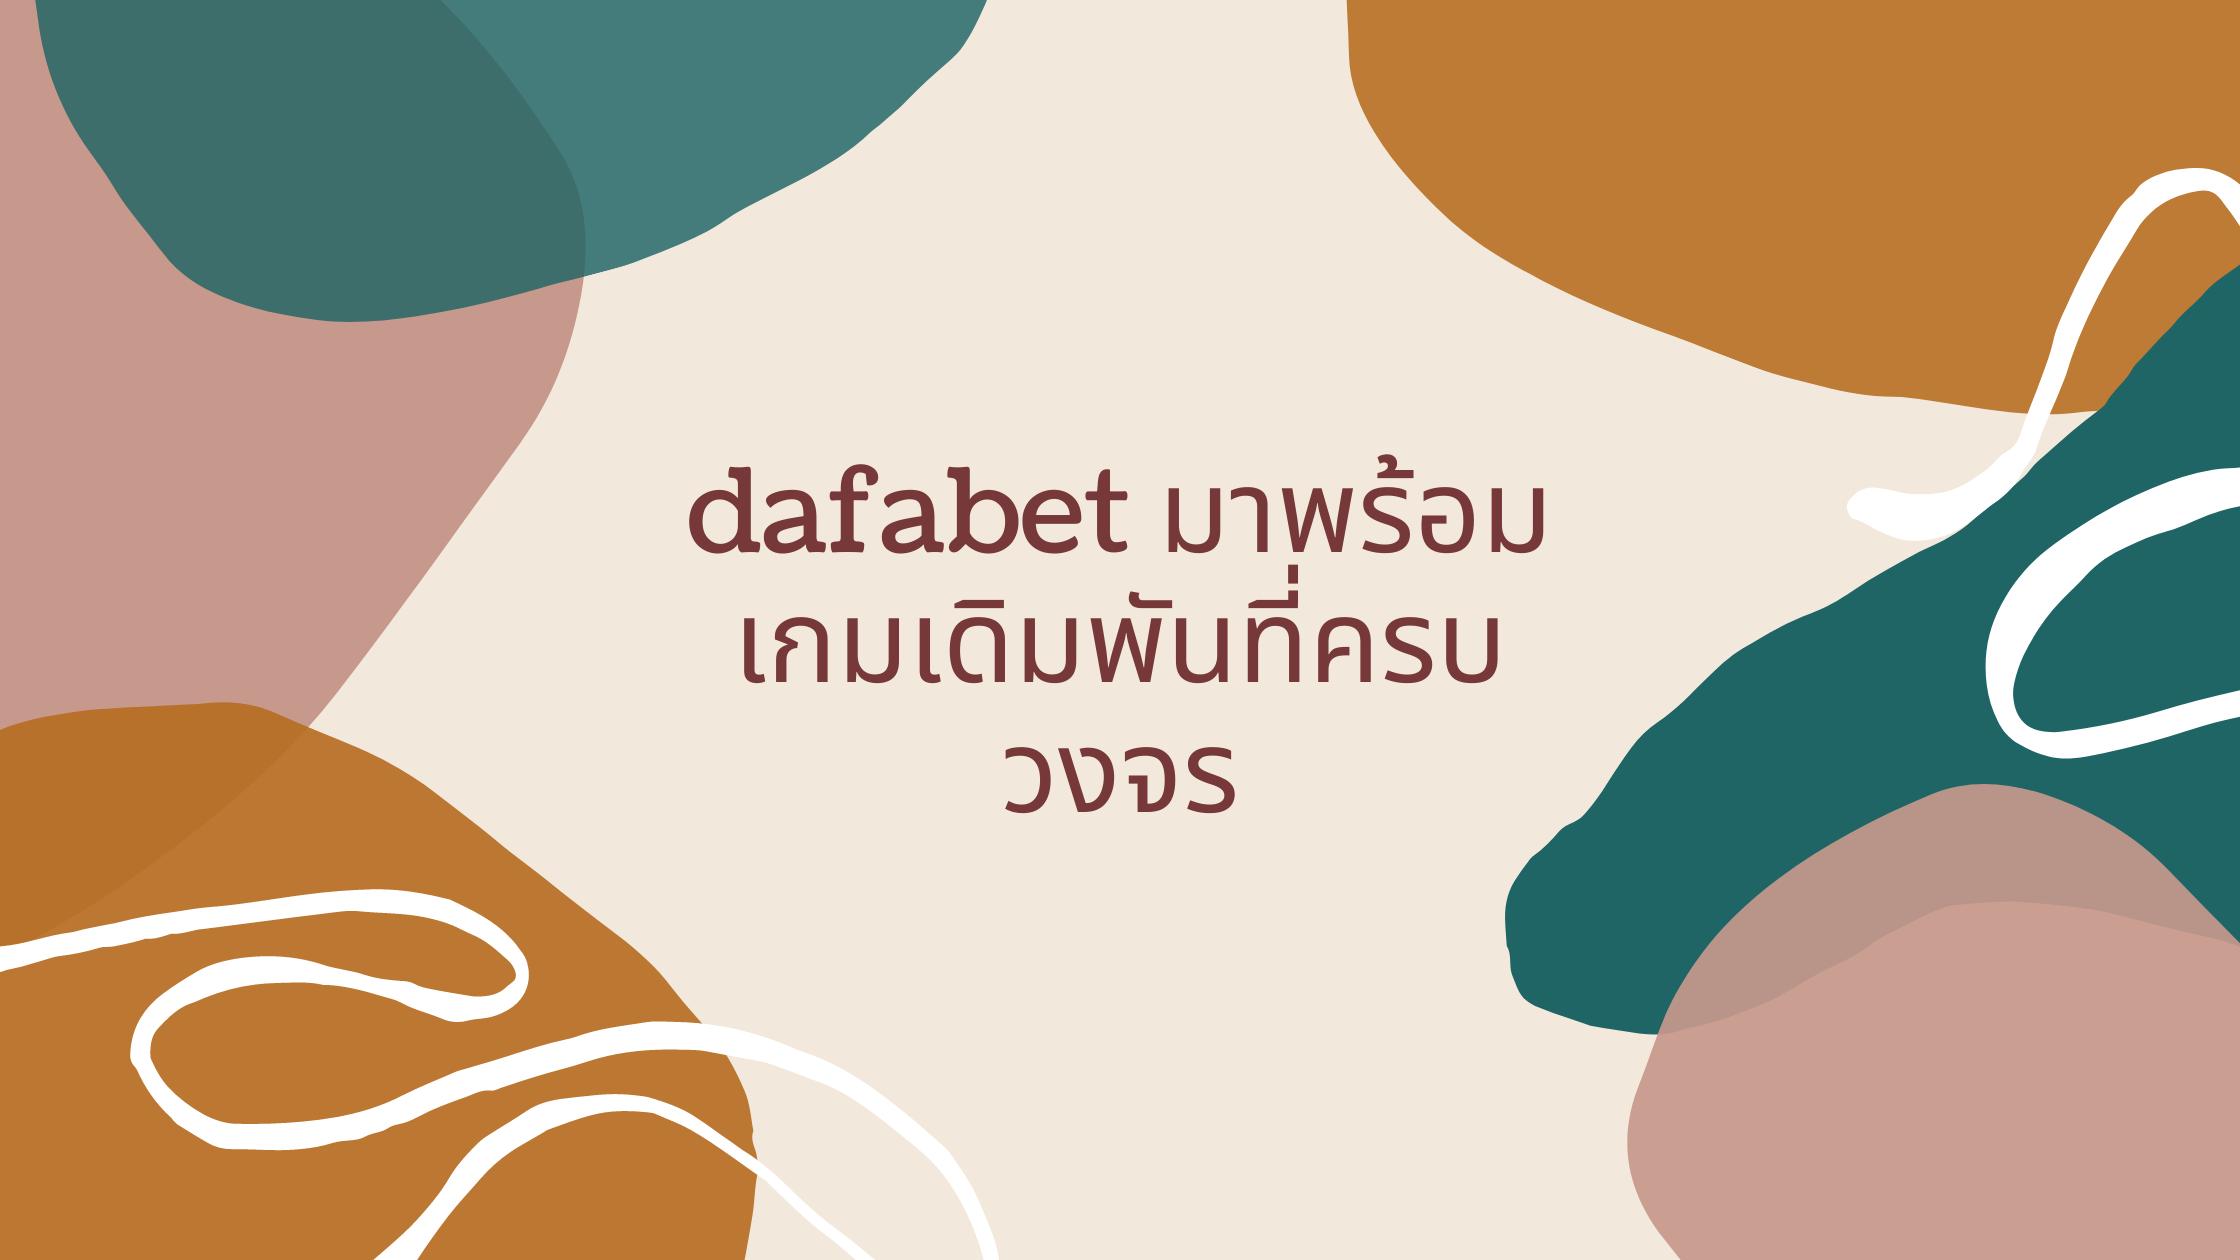 dafabet มาพร้อมเกมเดิมพันที่ครบวงจร